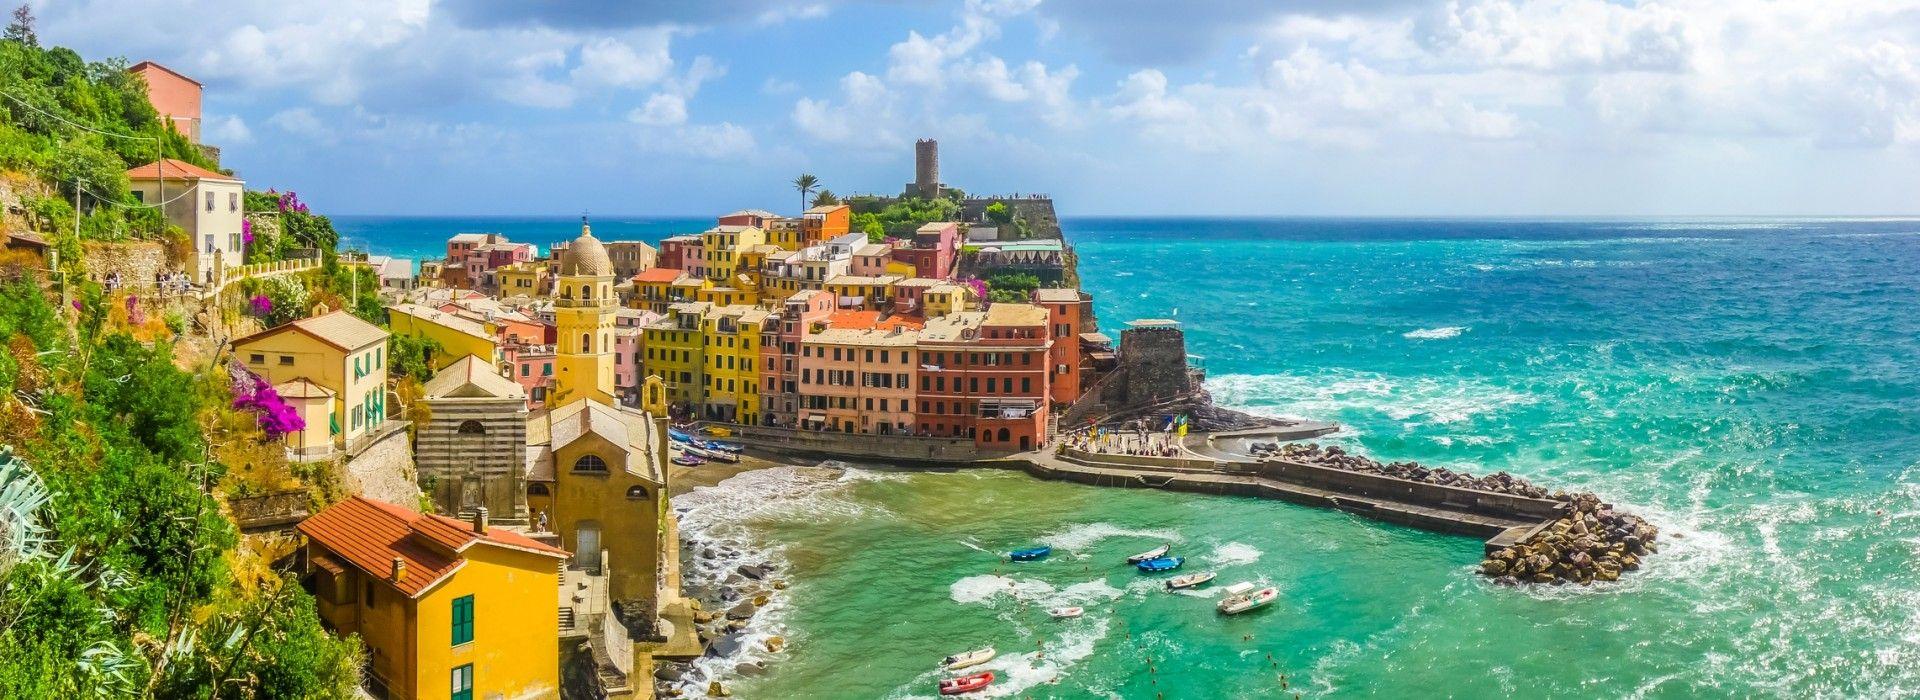 Basilicata & Calabria Tours